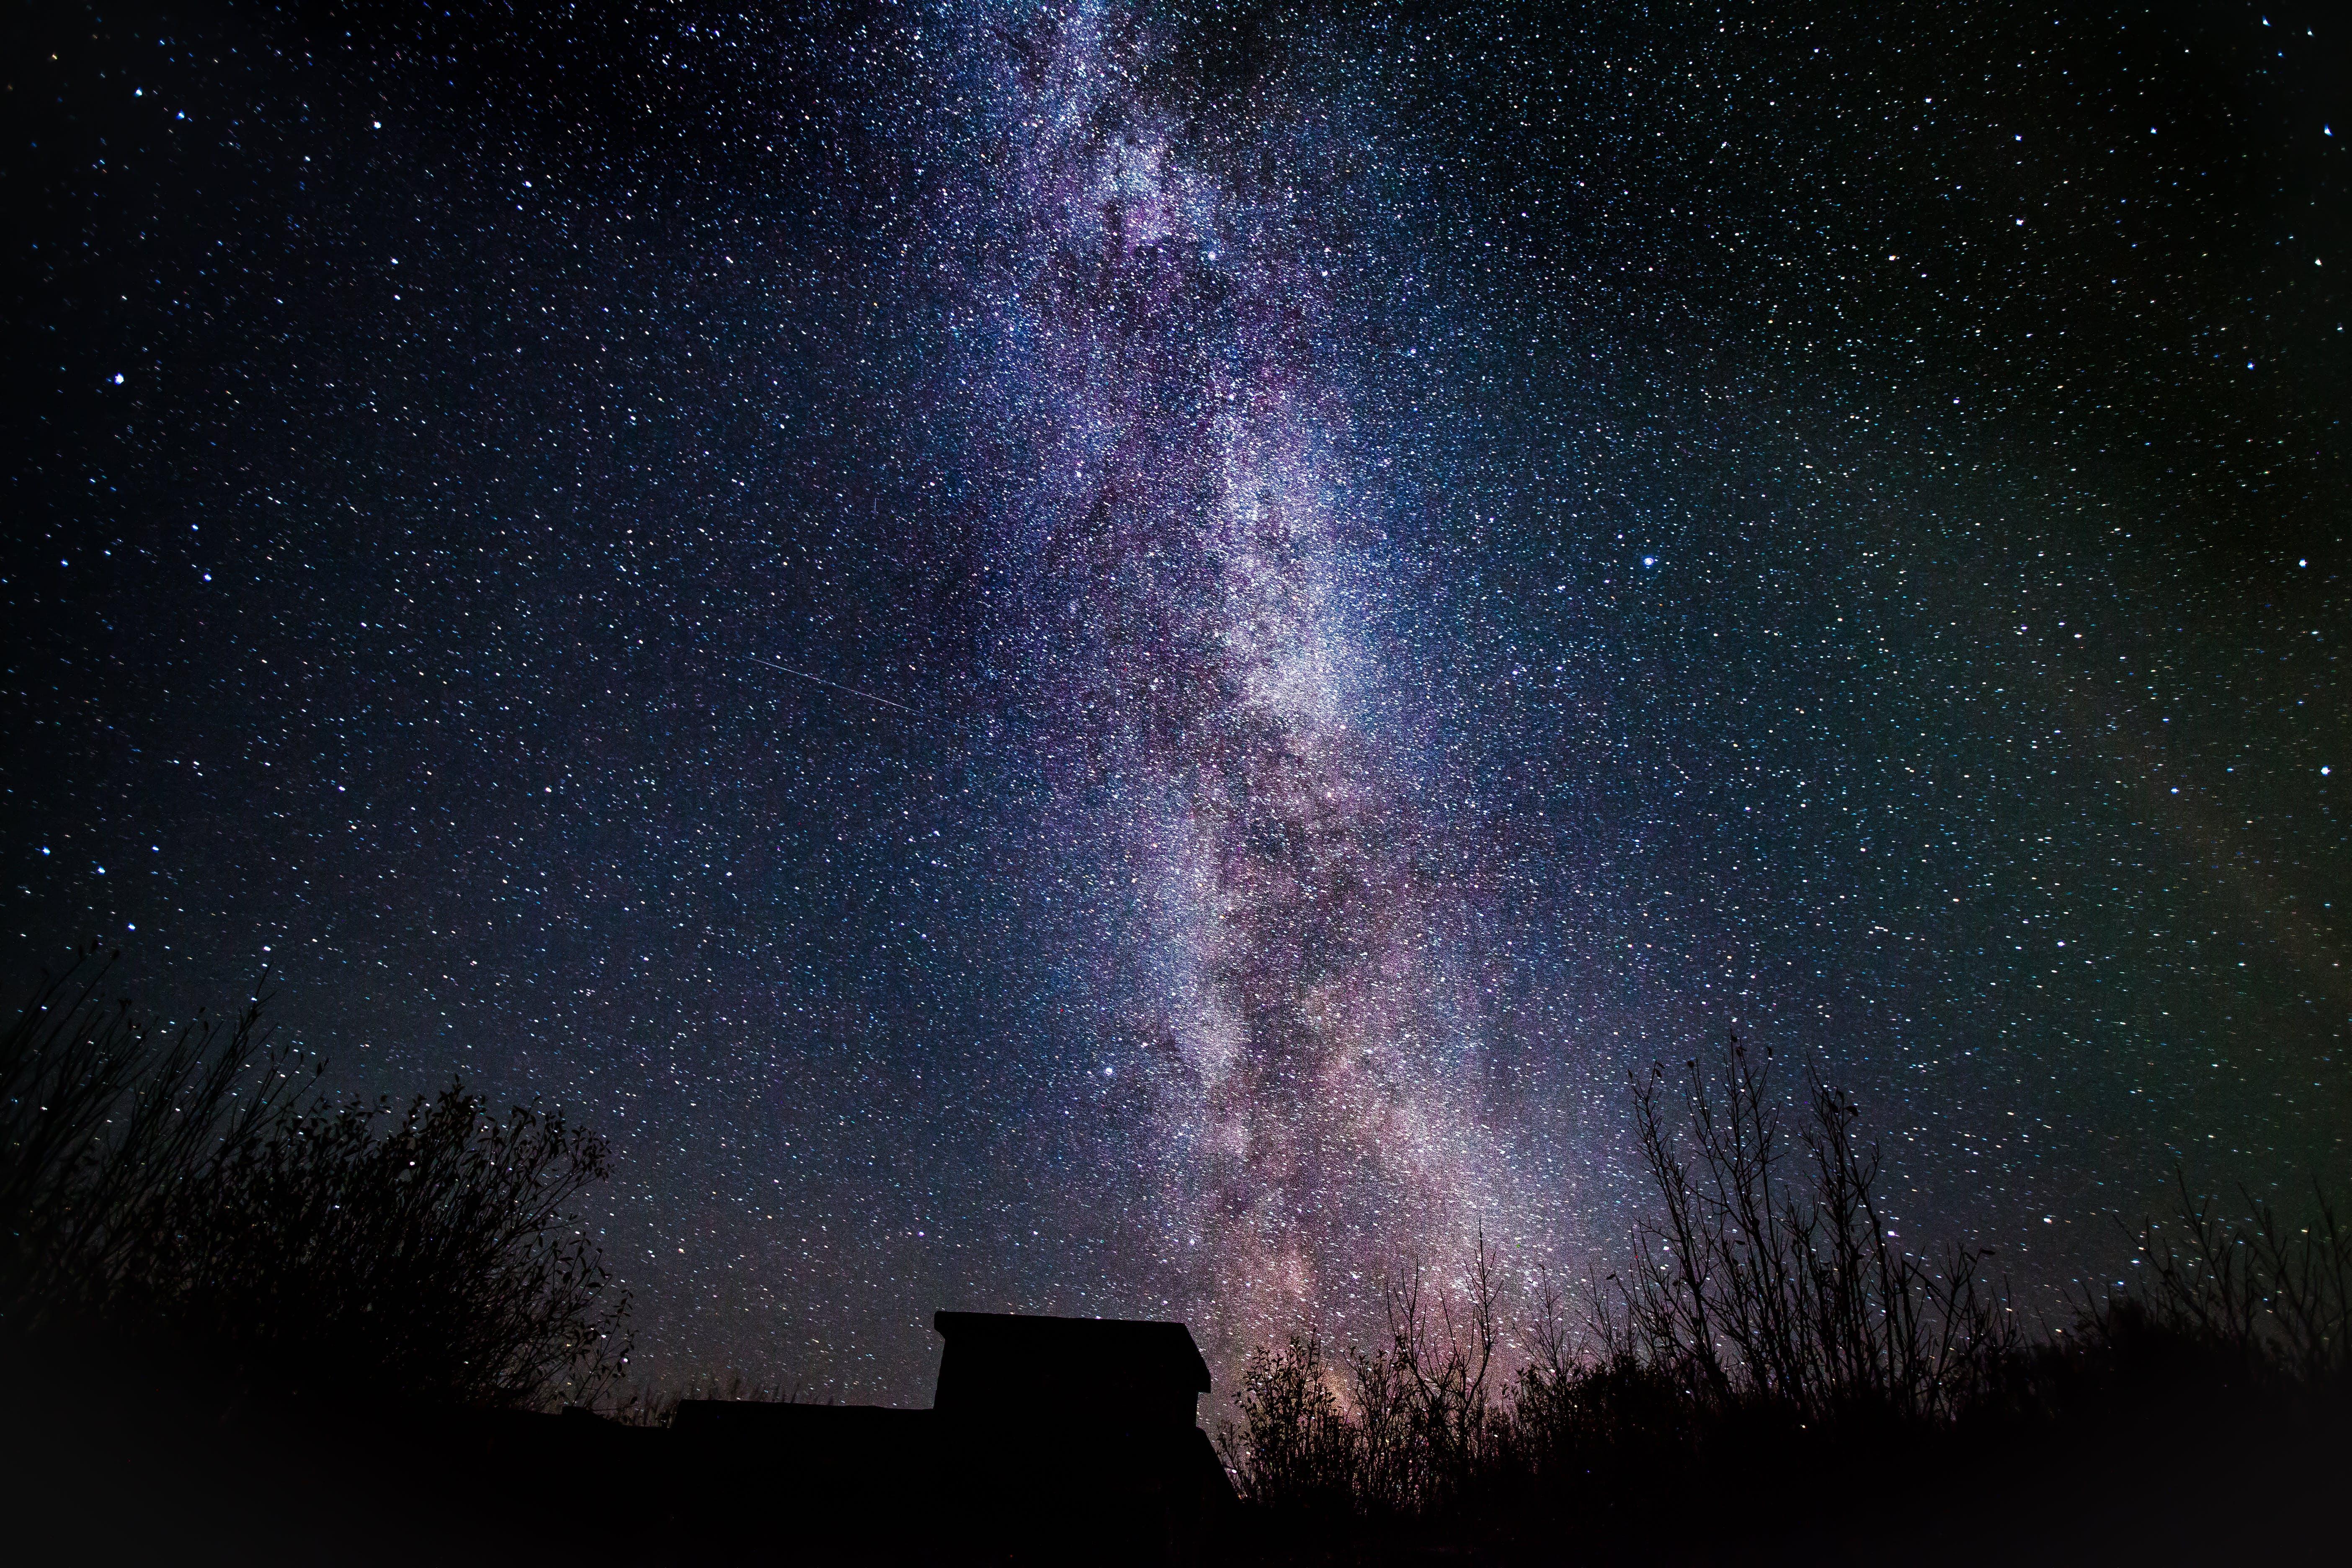 abend, astrologie, astronomie